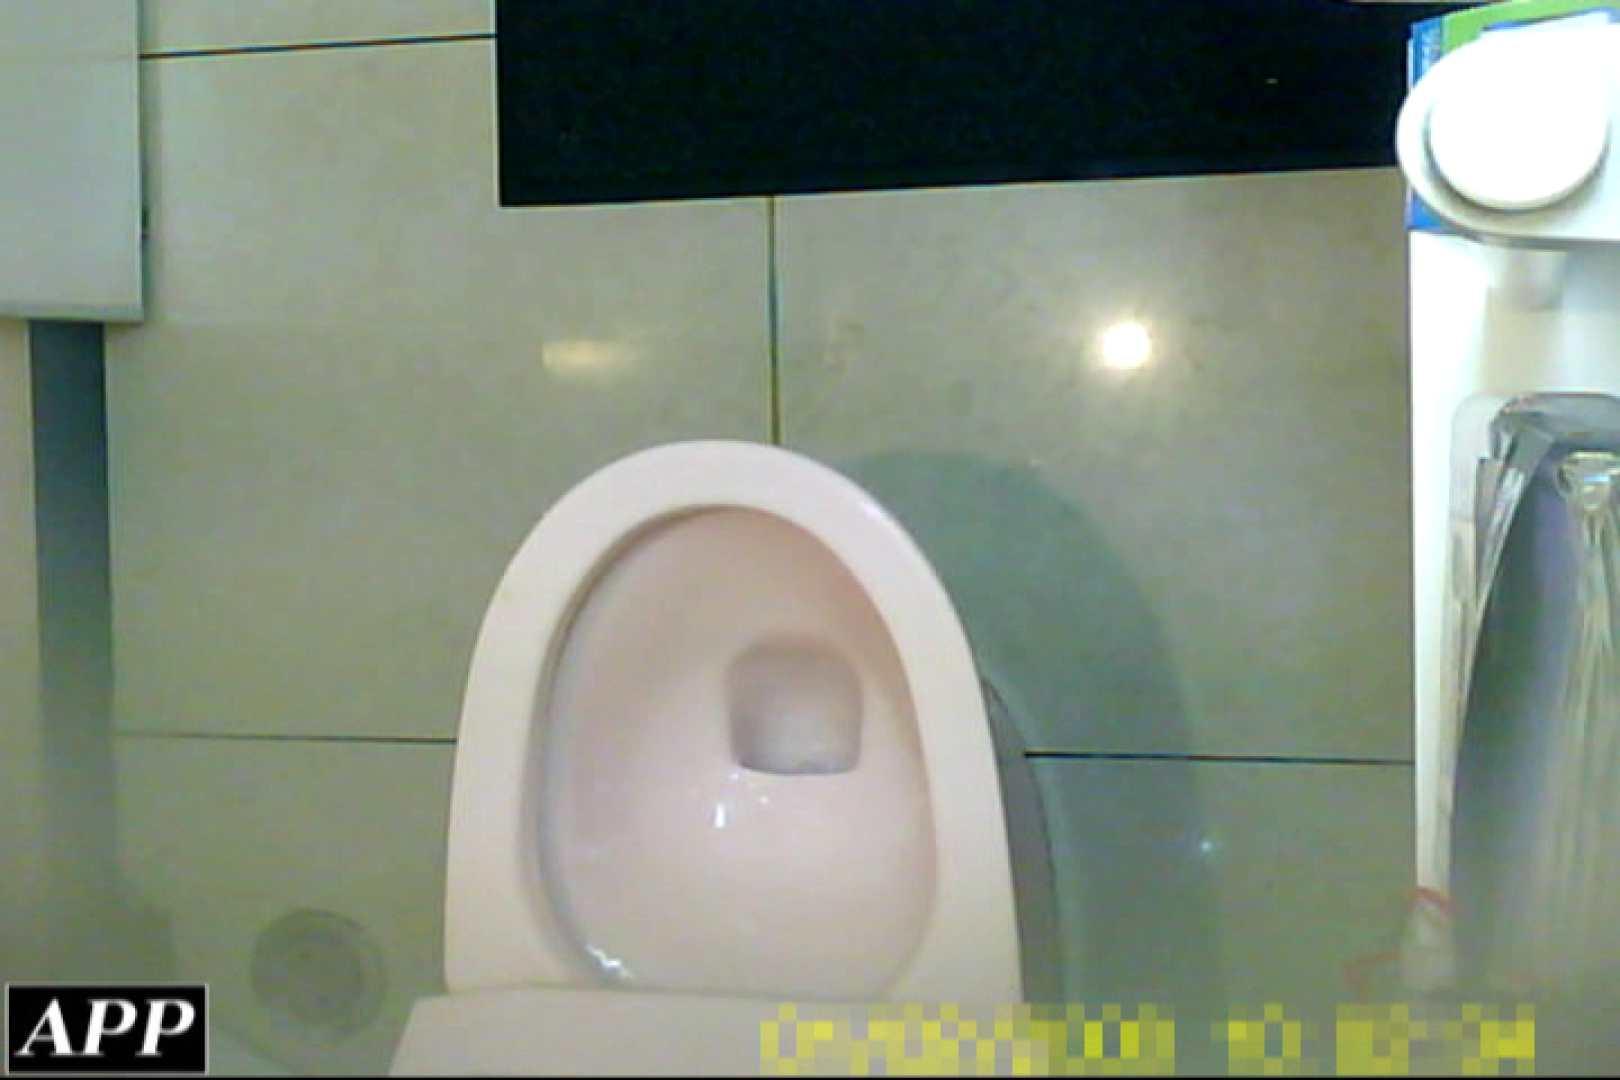 3視点洗面所 vol.121 OLハメ撮り  86Pix 65